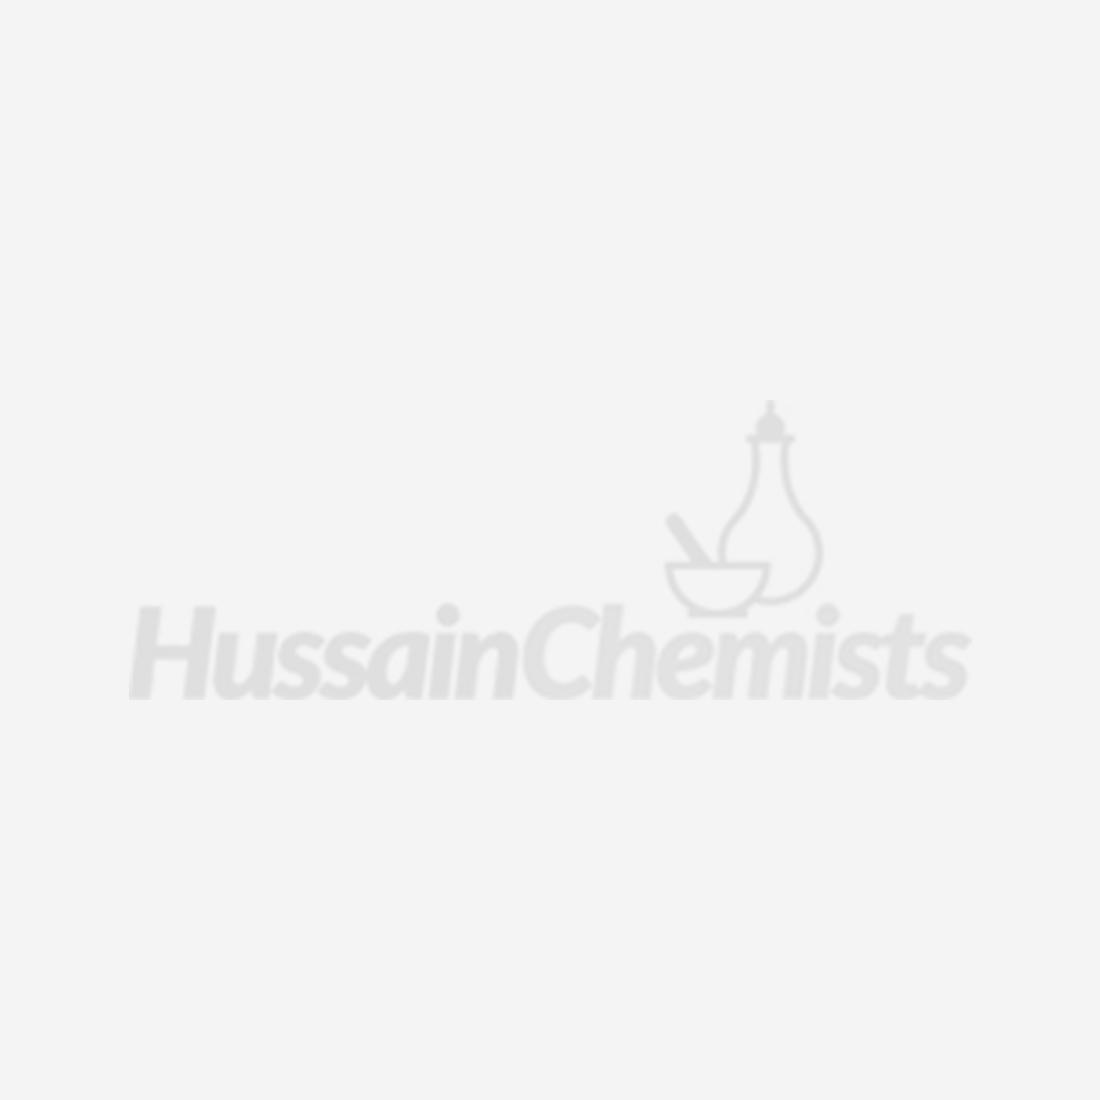 Audiclean 115ml Ear Cleaning Sea Serum